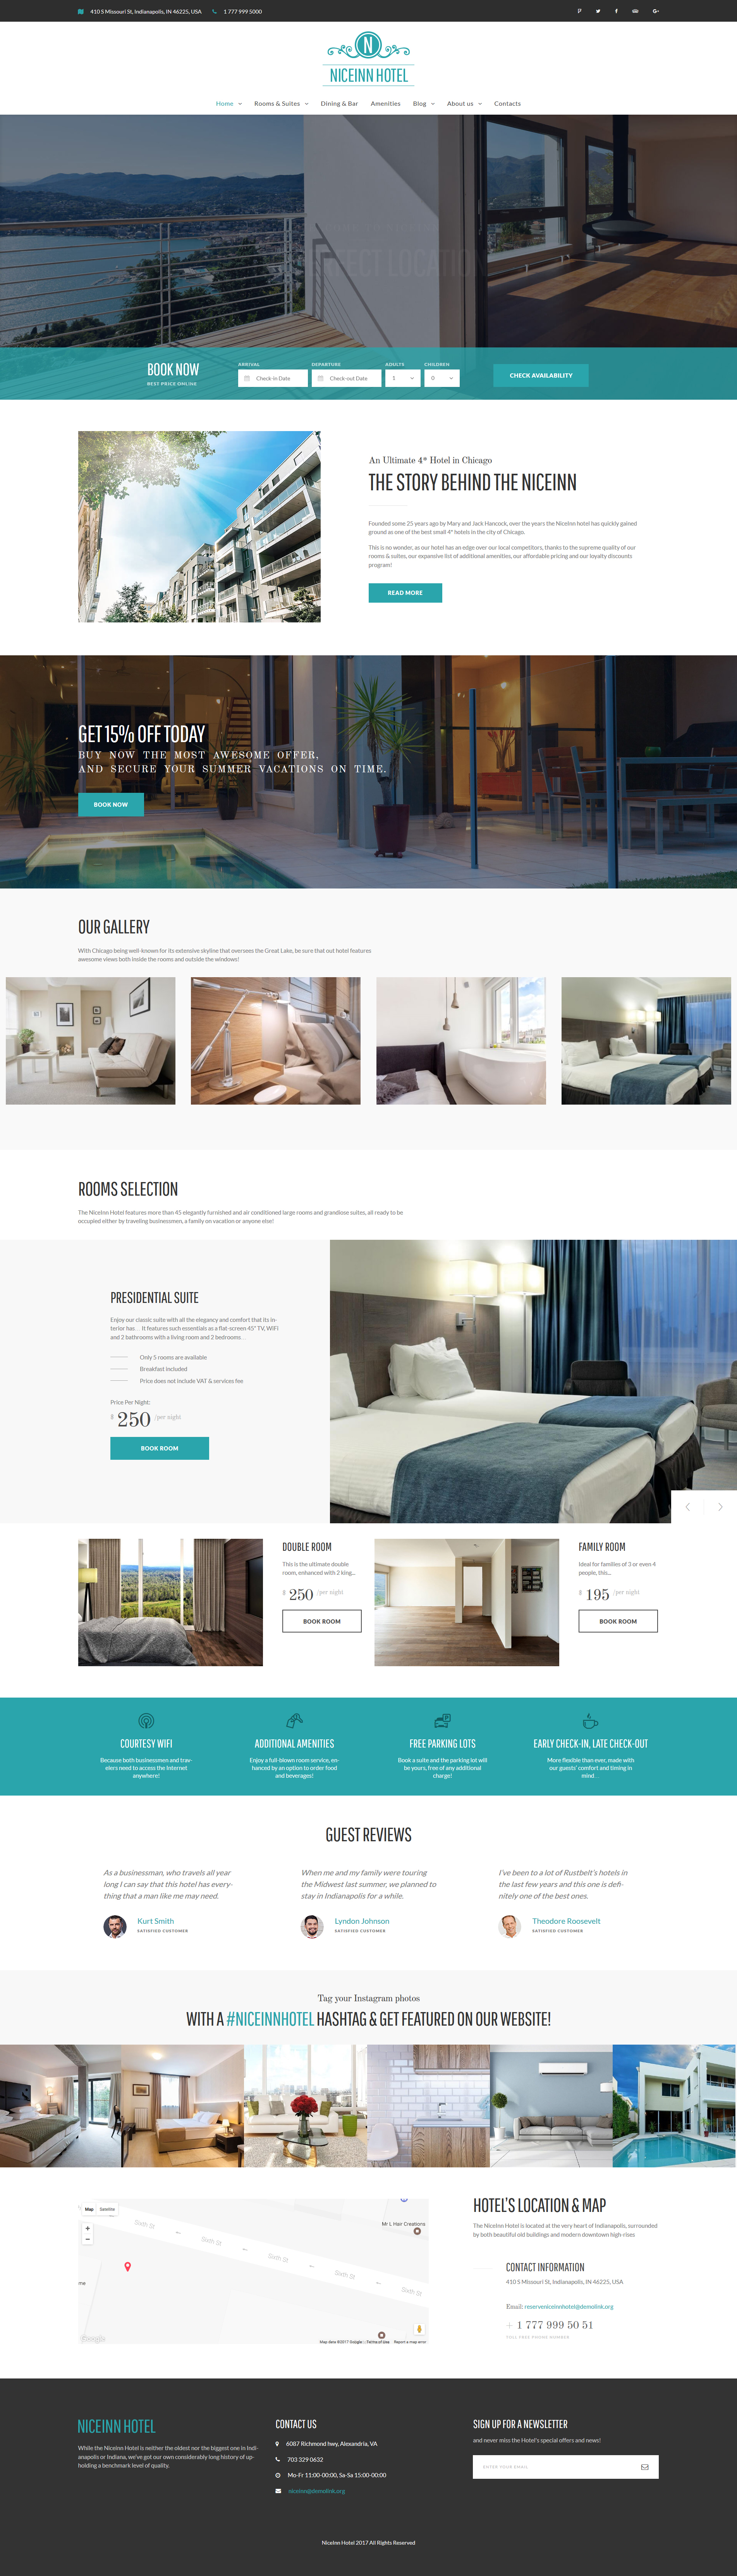 "Responzivní WordPress motiv ""NiceInn - Small Hotel Responsive"" #61237 - screenshot"